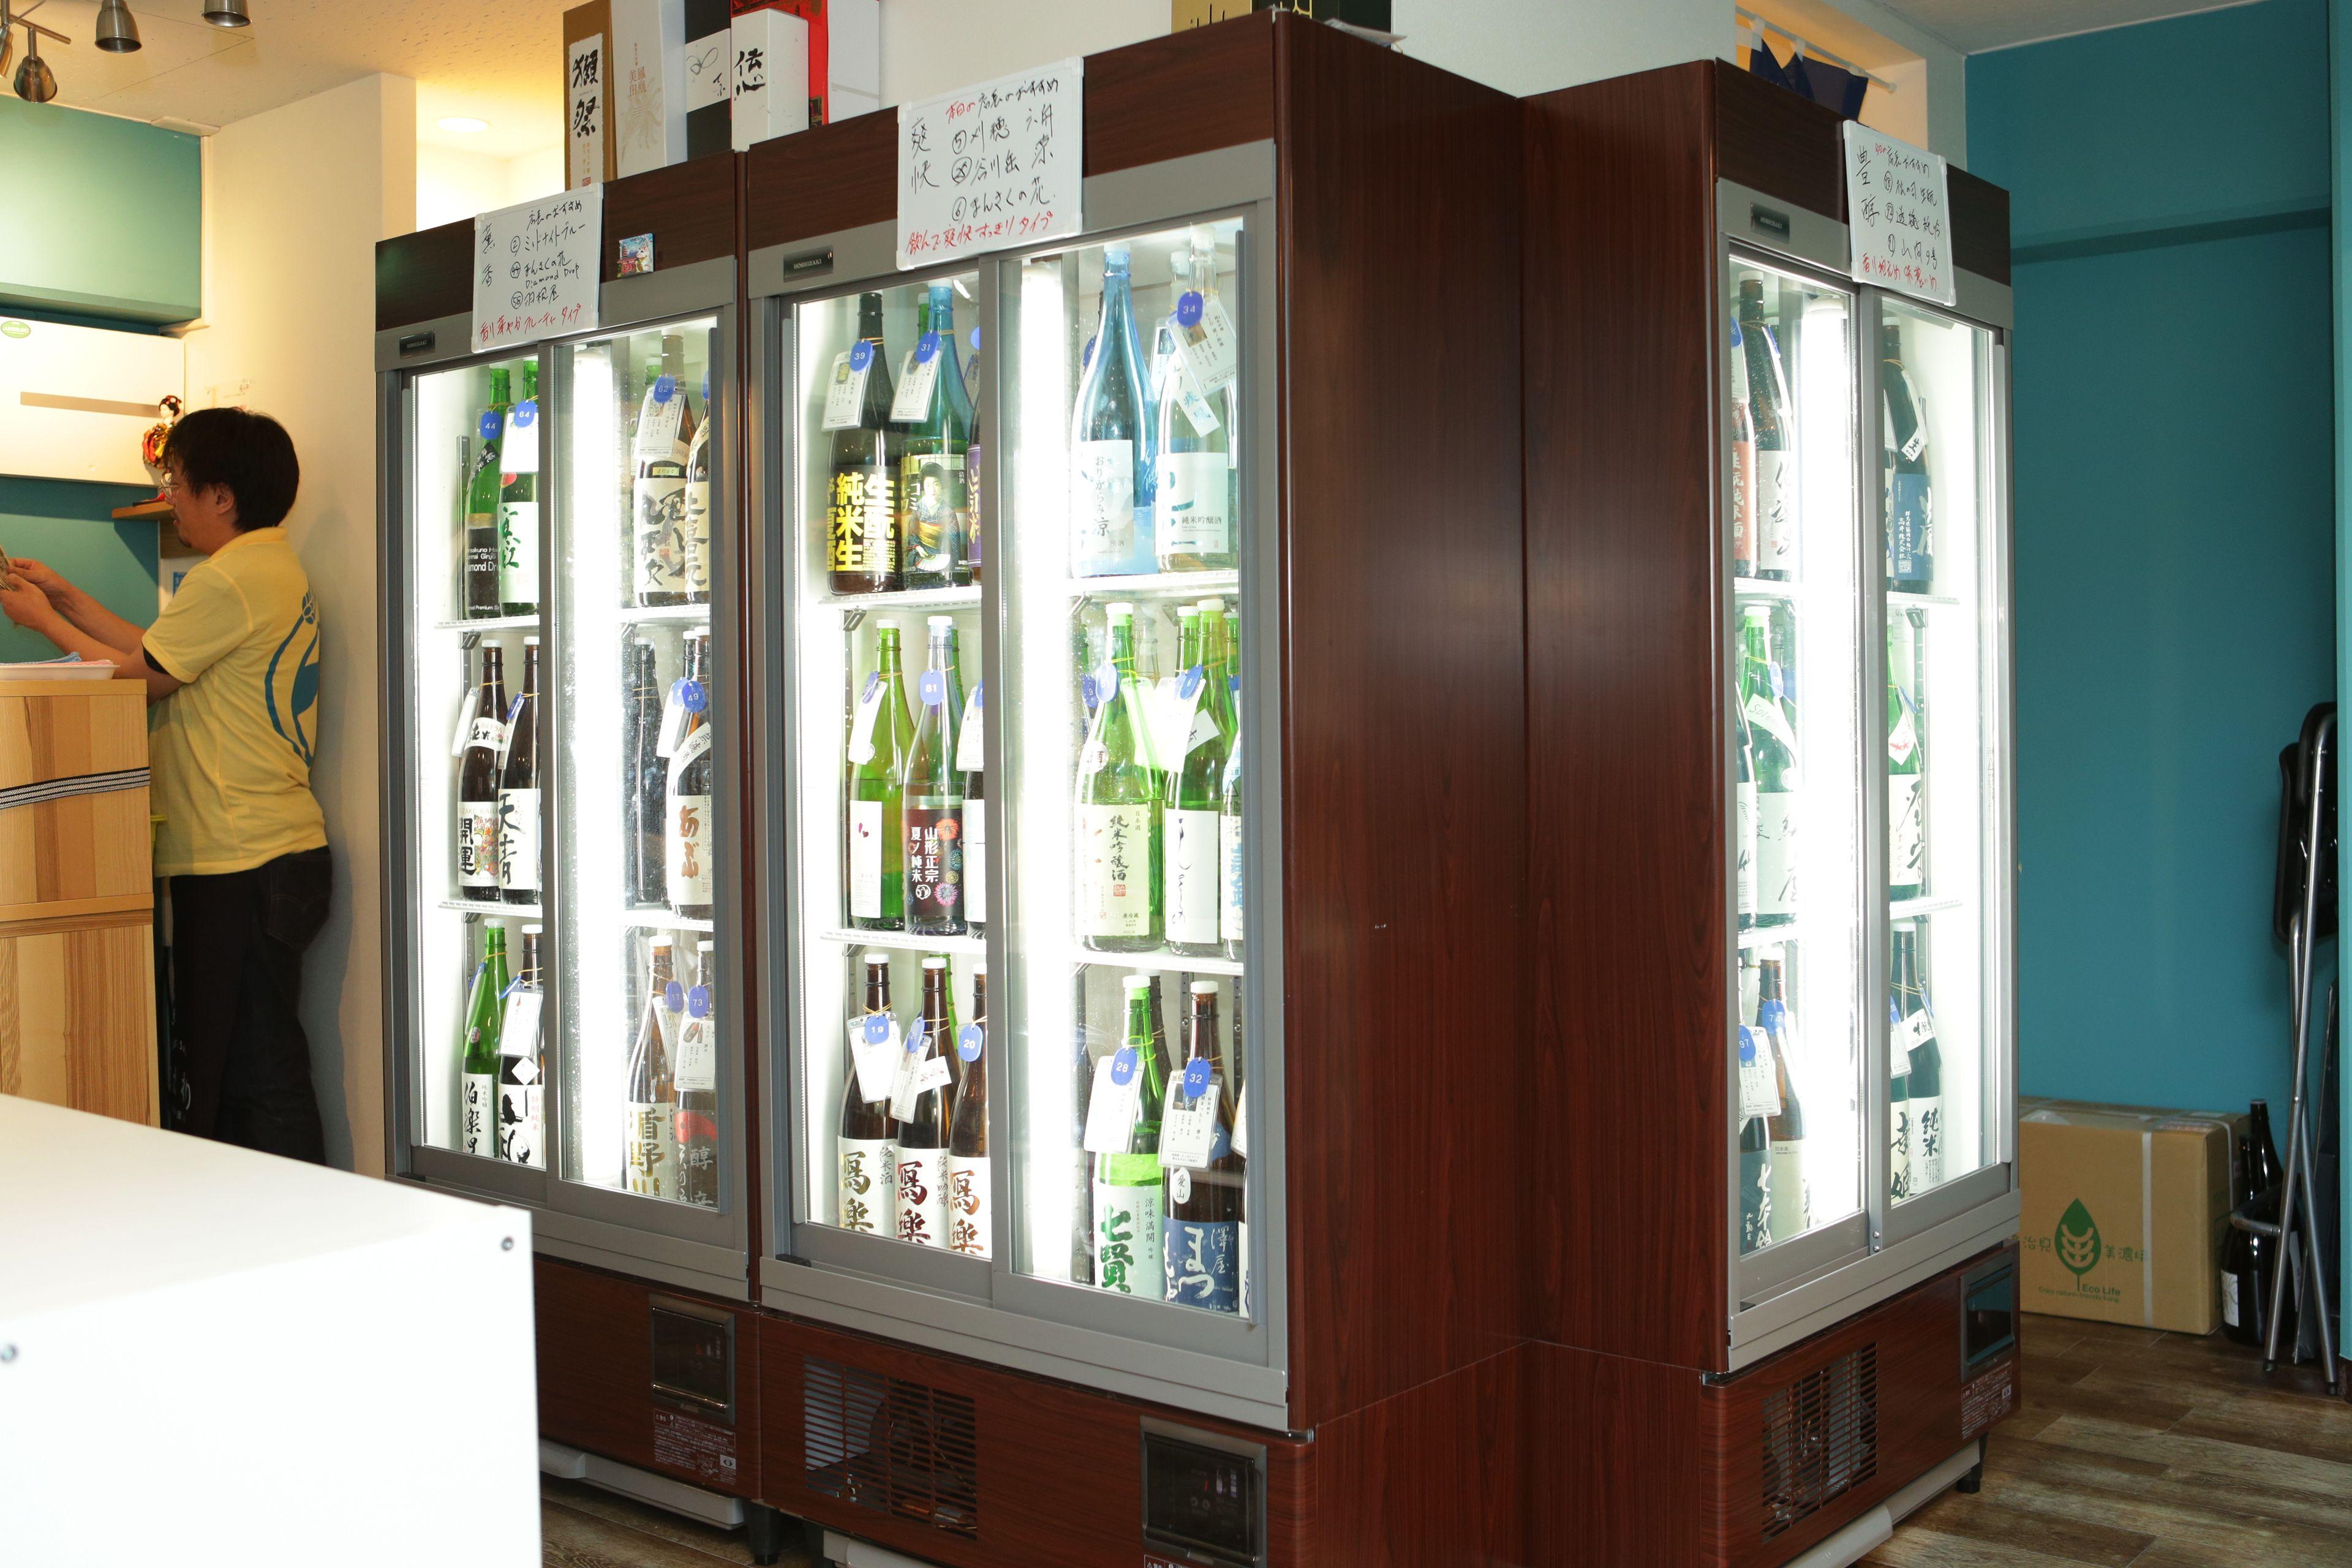 A refrigerator full of sake